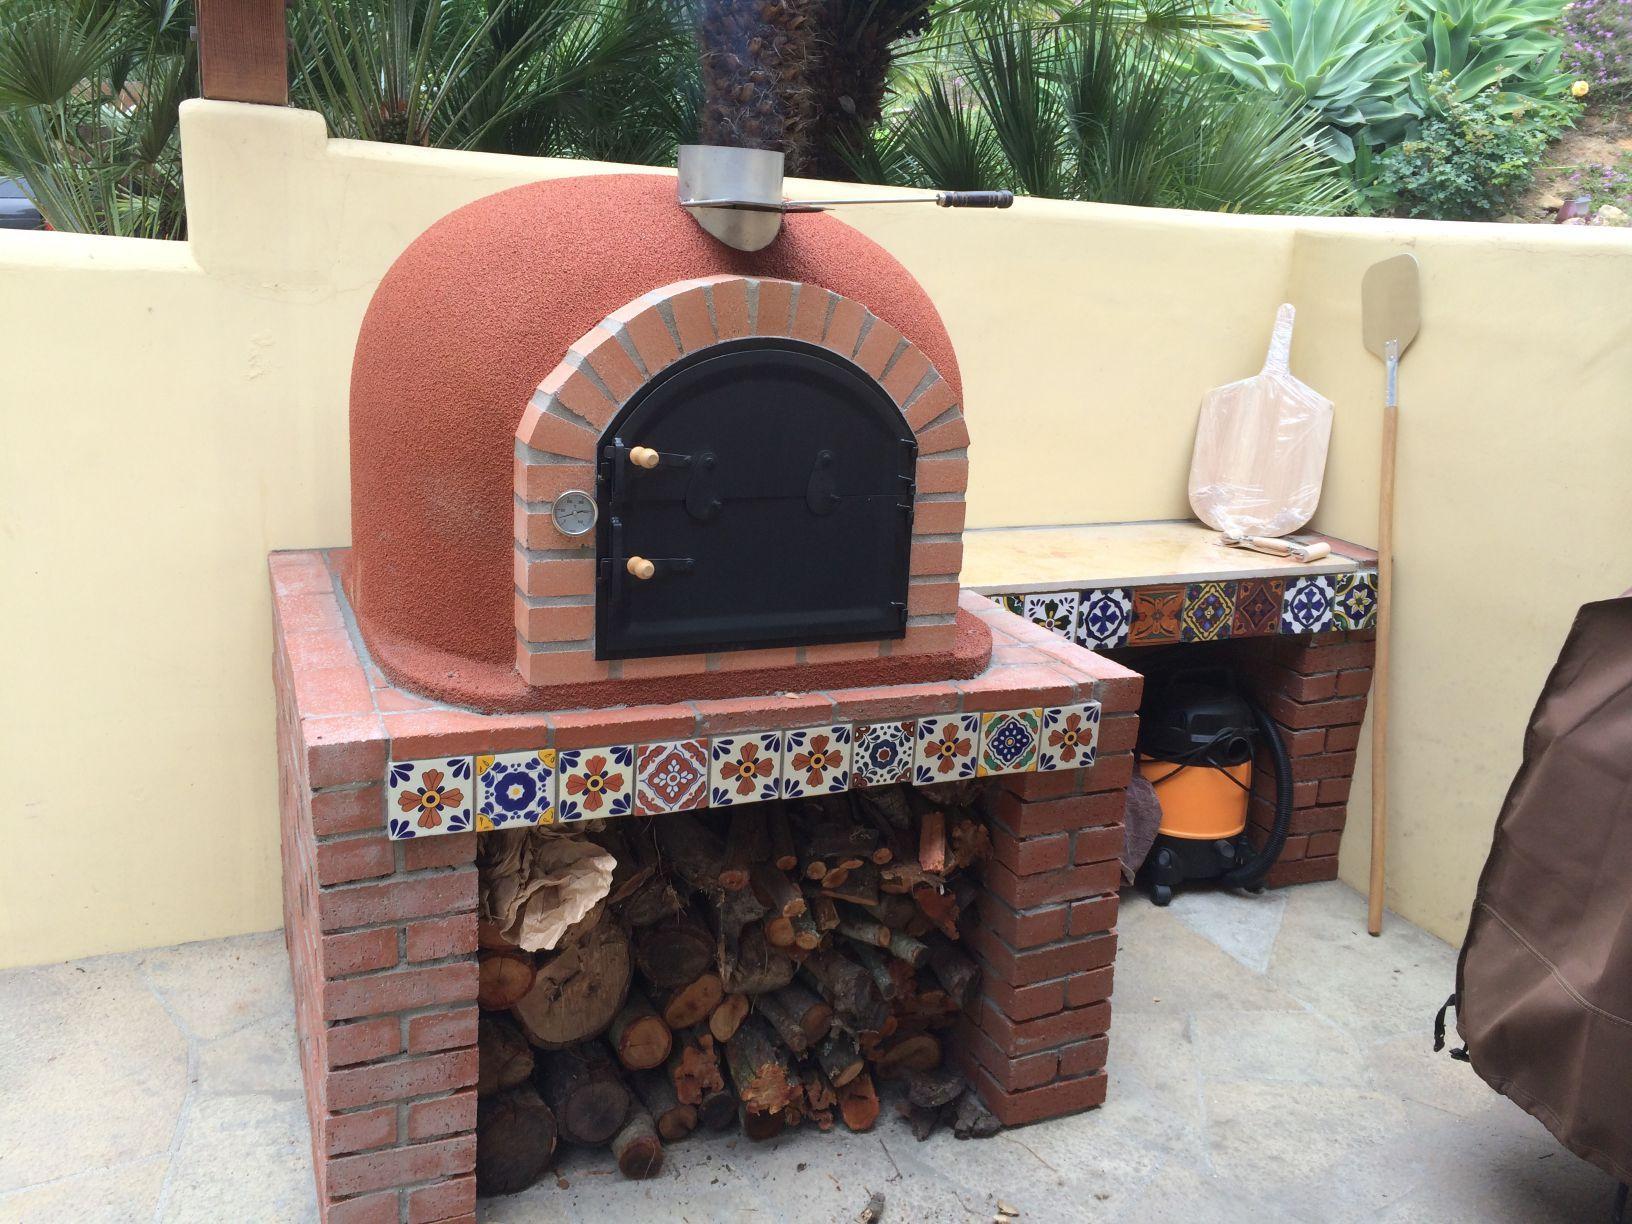 Backyard wood fired oven from portugal terracotta inside brick